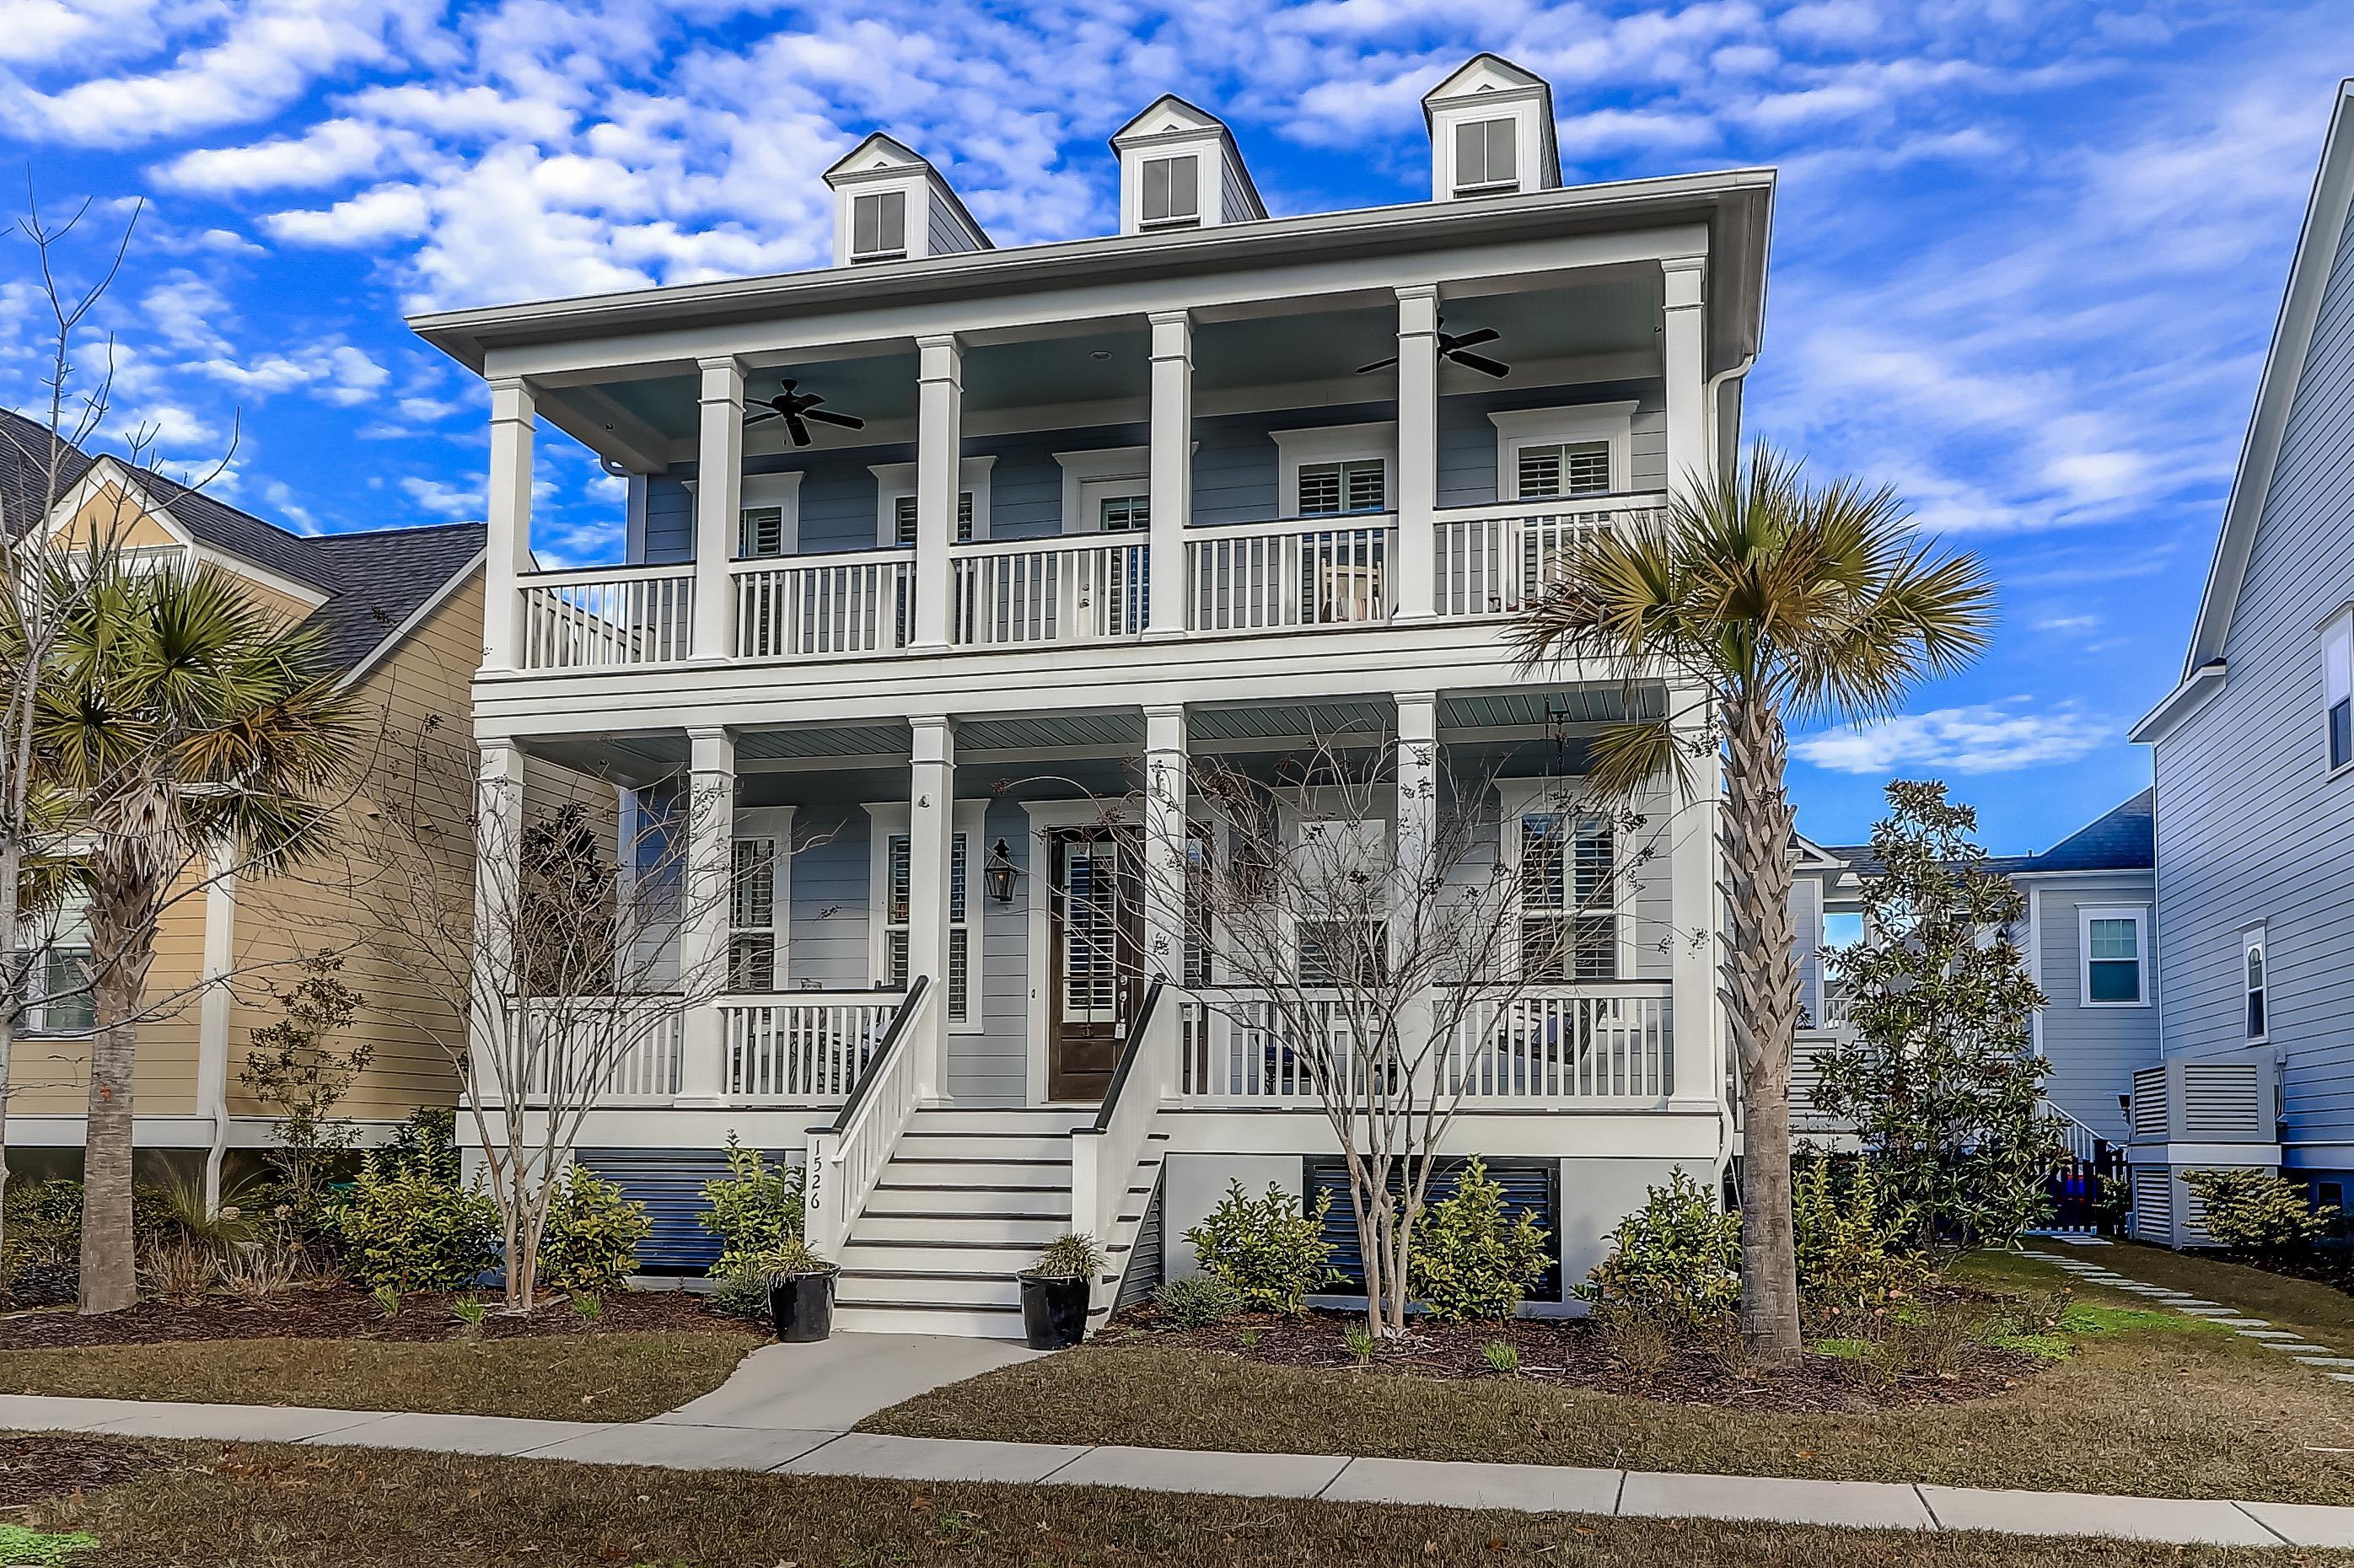 Daniel Island Homes For Sale - 1526 Willtown, Daniel Island, SC - 5